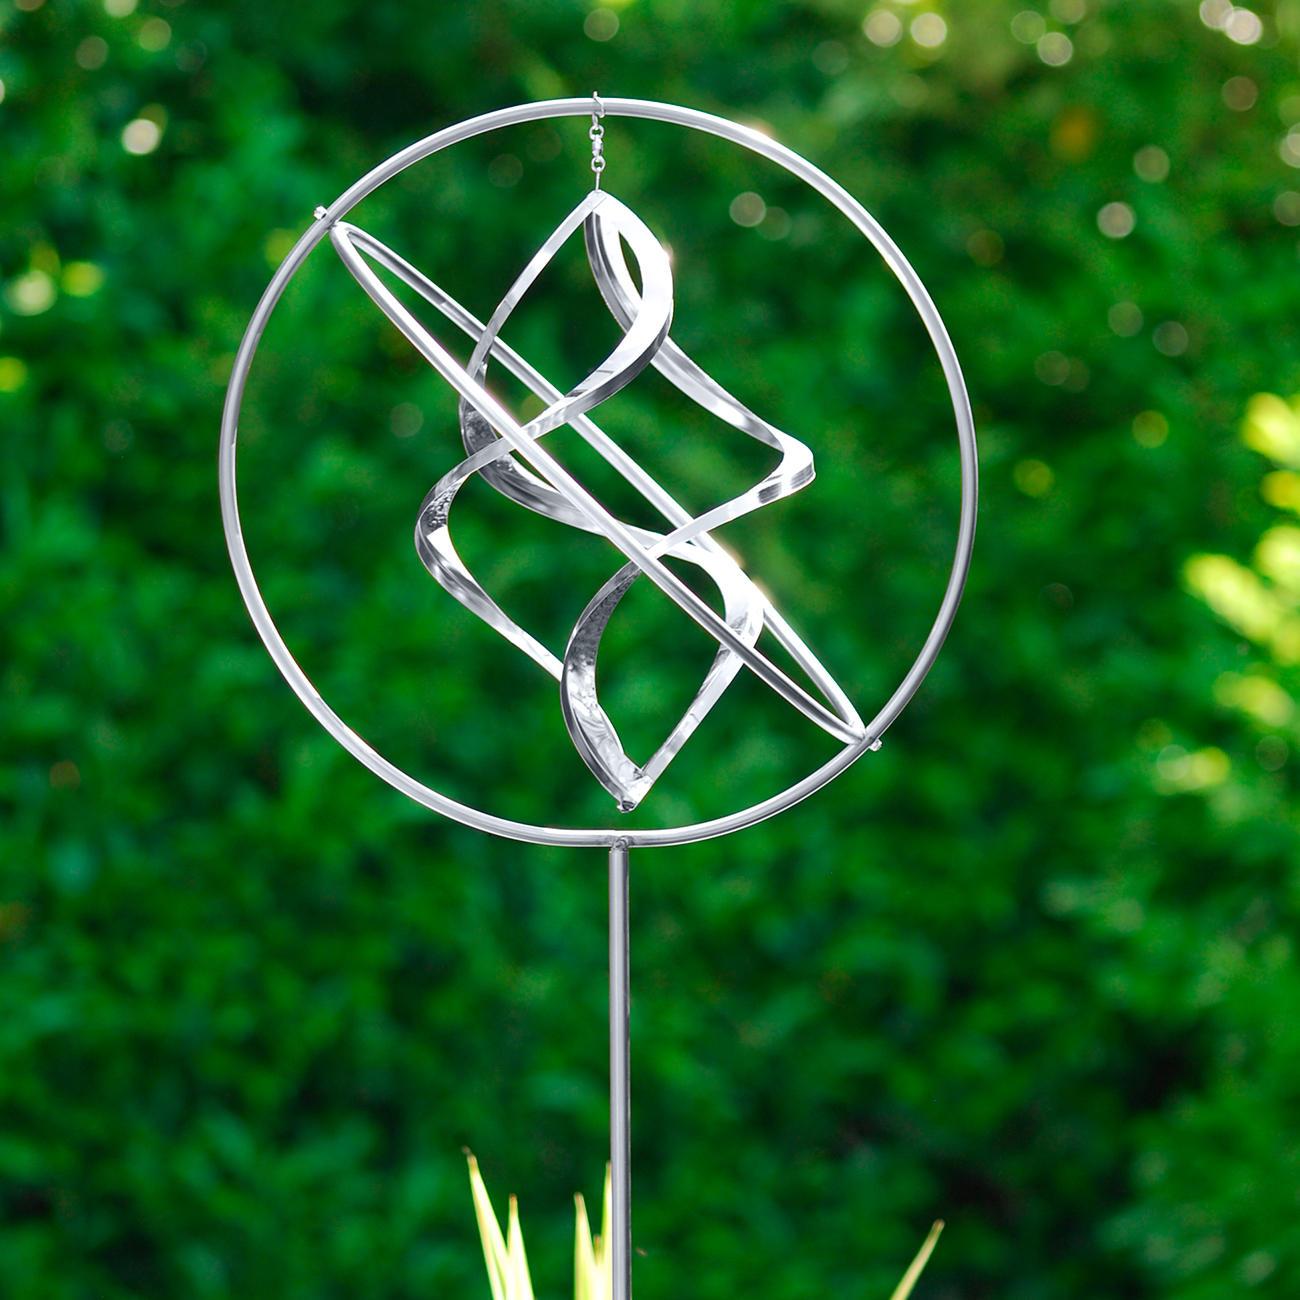 Edelstahl-Windspiel, Wind Dancer , Edelstahl, Edelstahl-Skulptur, rostfrei :: Silber -  -  - Erwachsene